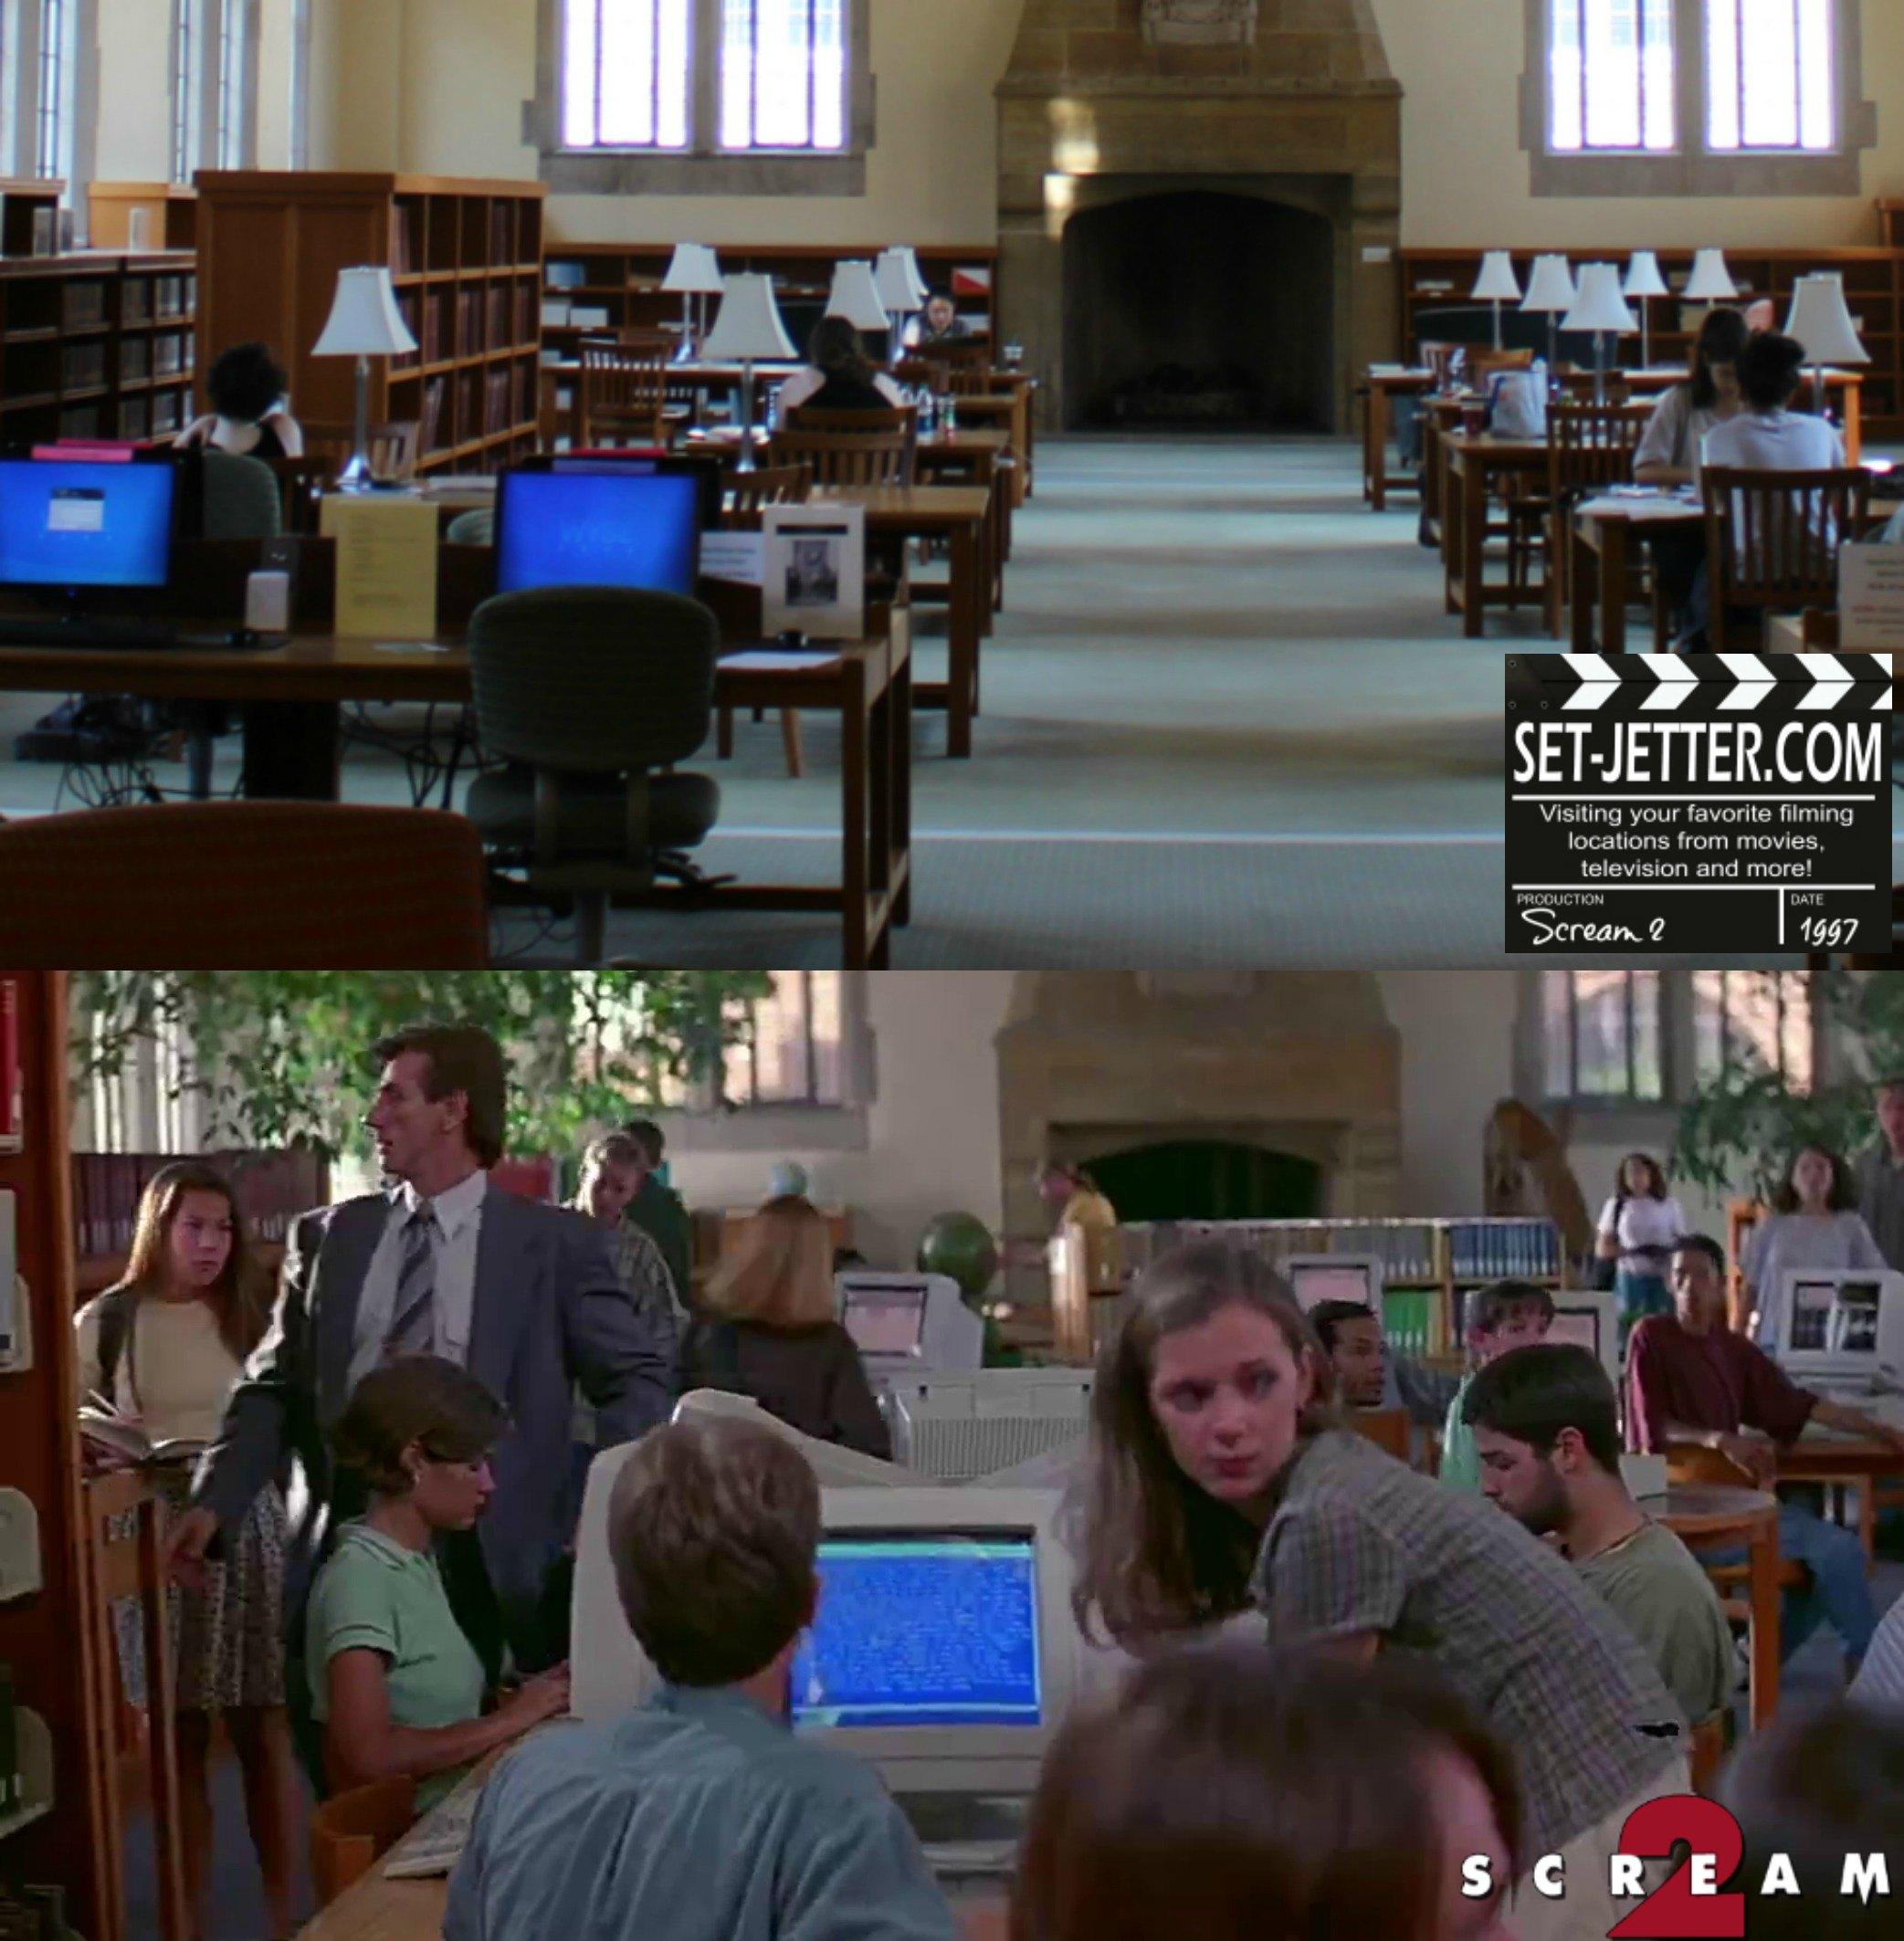 Scream 2 comparison 187.jpg